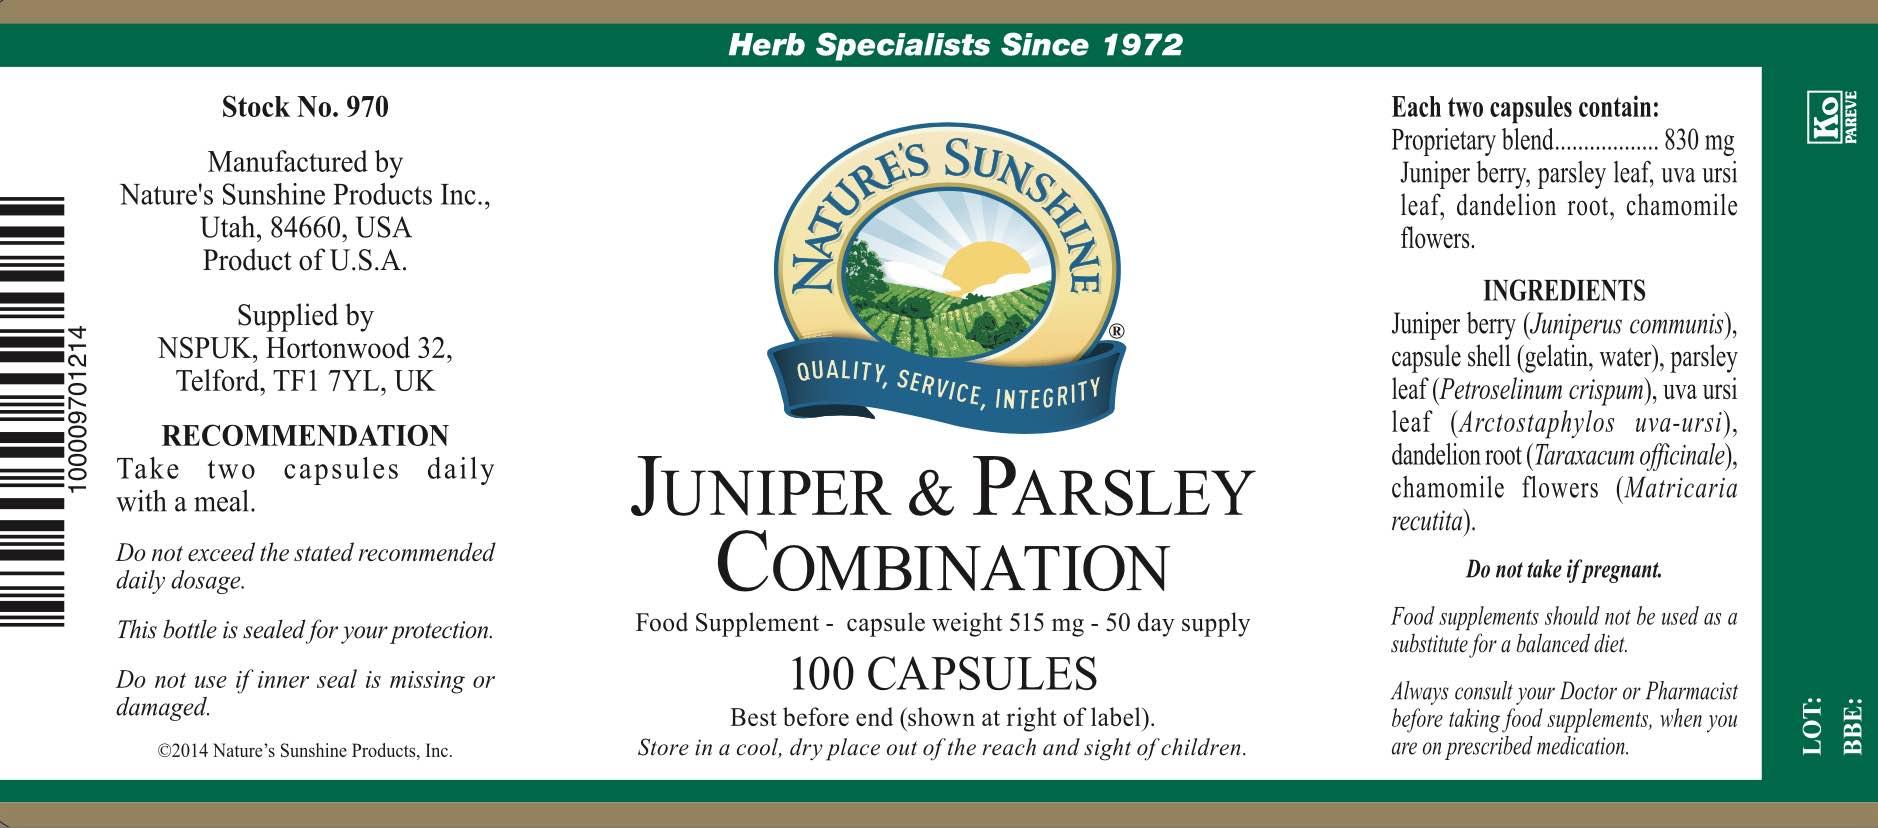 Nature's Sunshine Juniper & Parsley Combination - Label